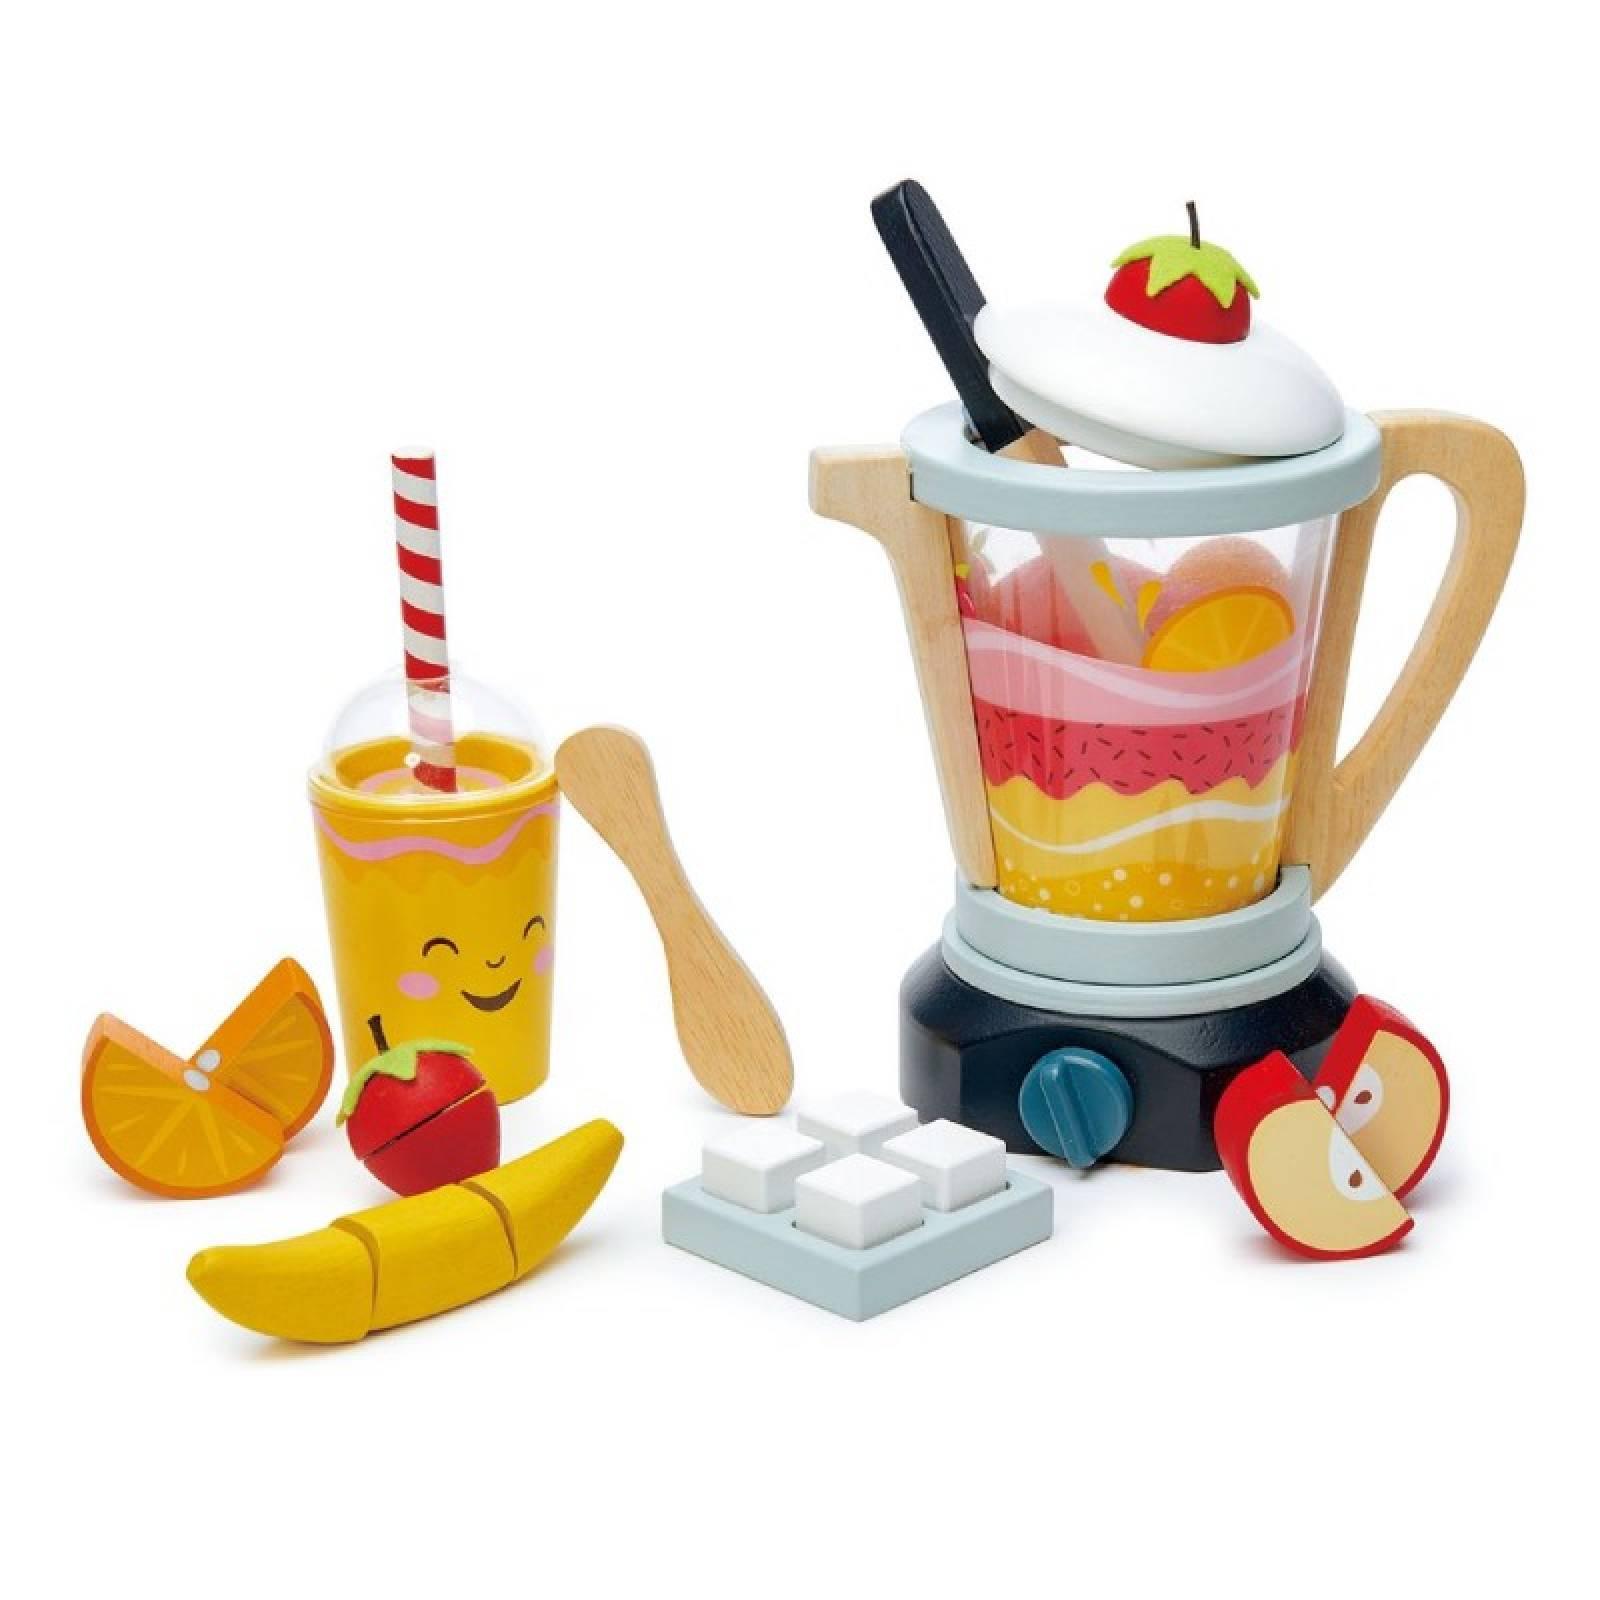 Fruity Blender Wooden Play Food Toy Set 3+